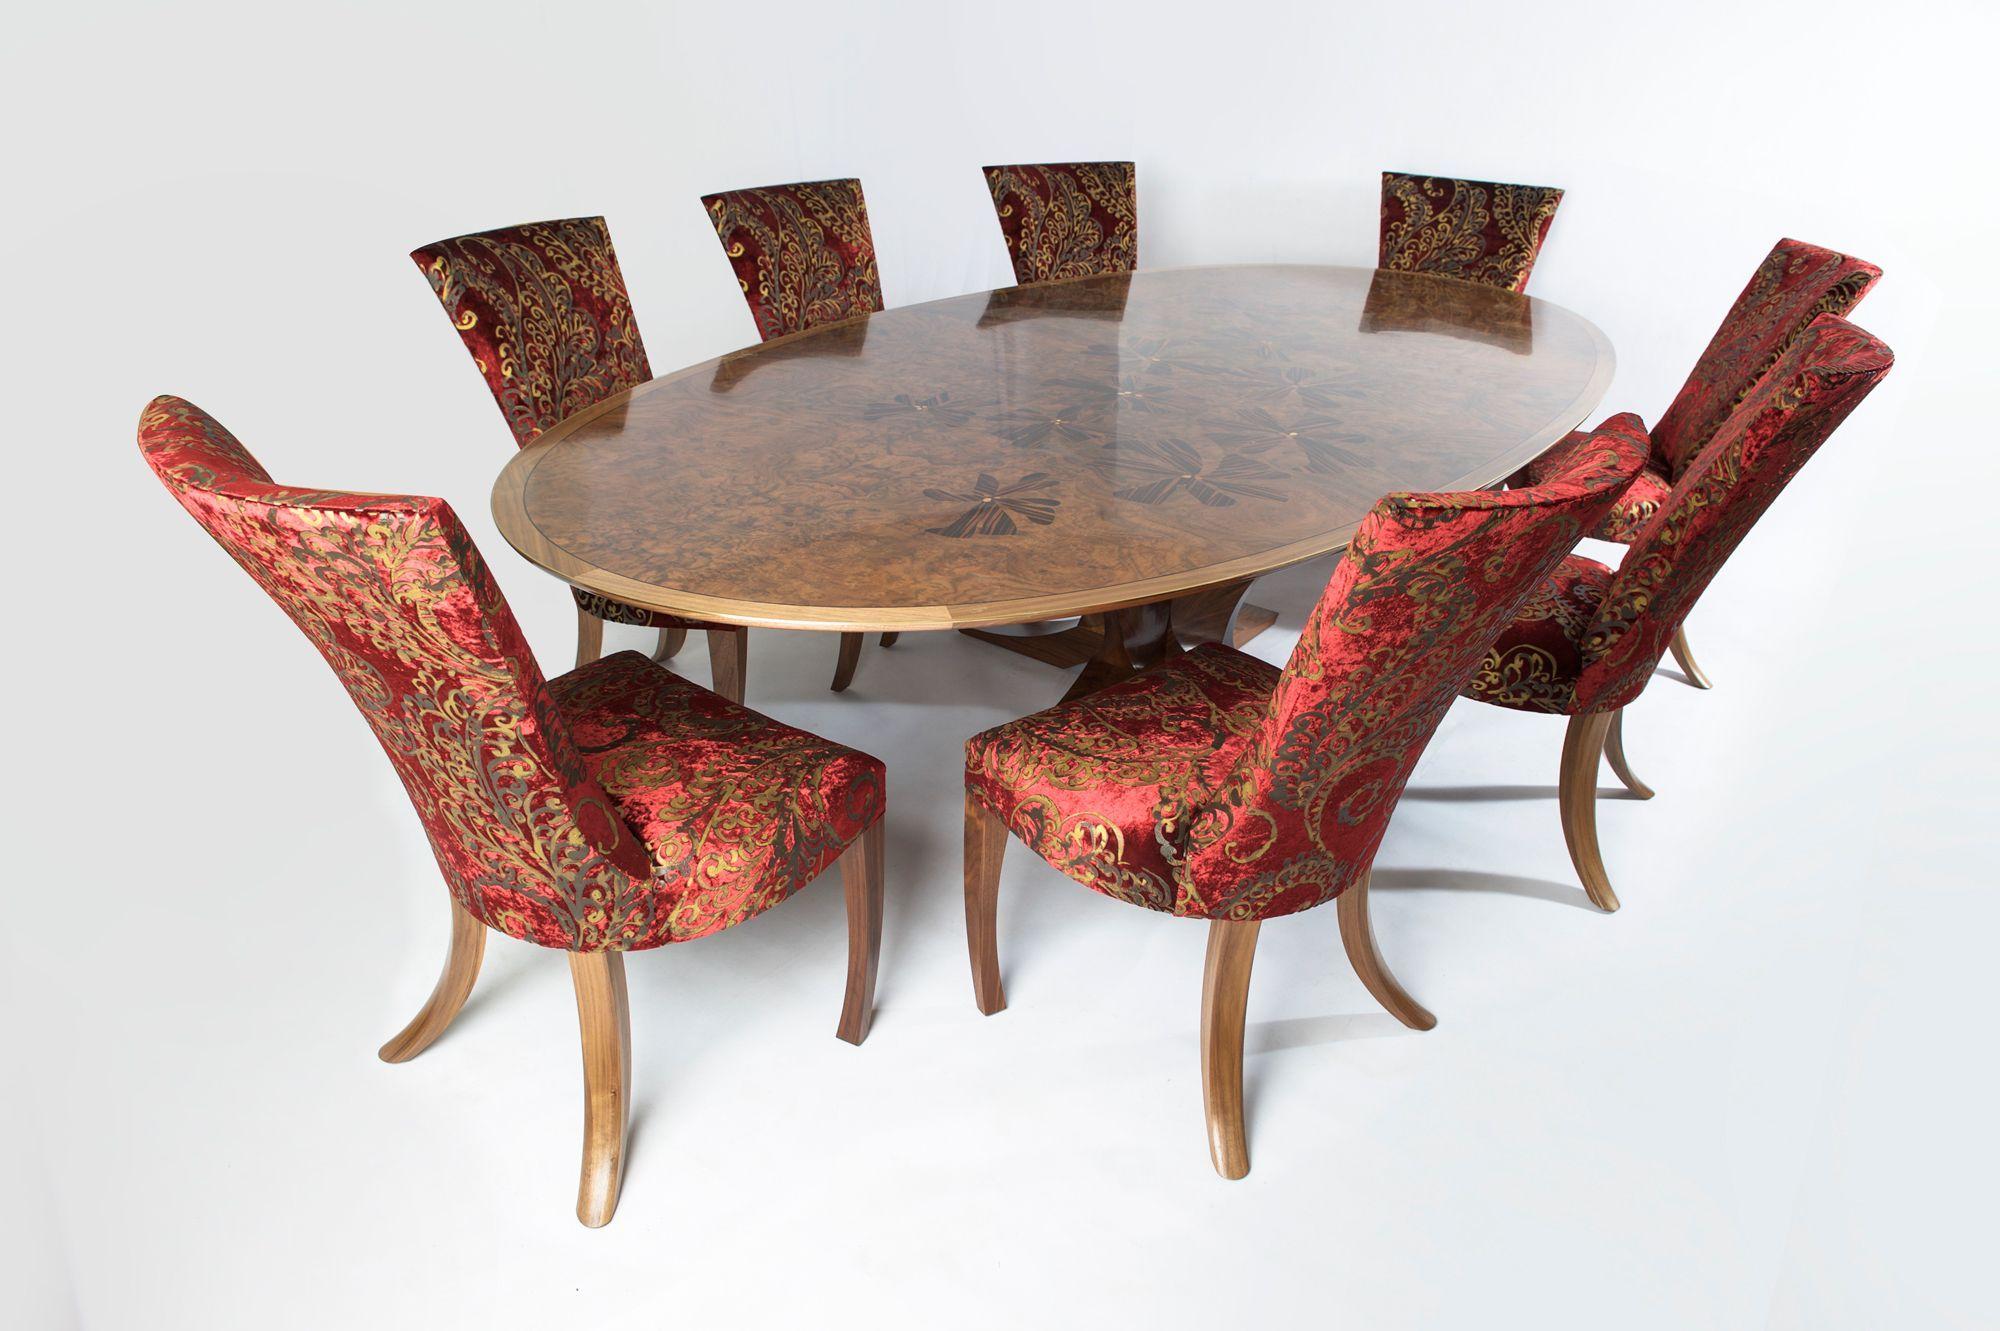 dubai-dining-table-chairs-1